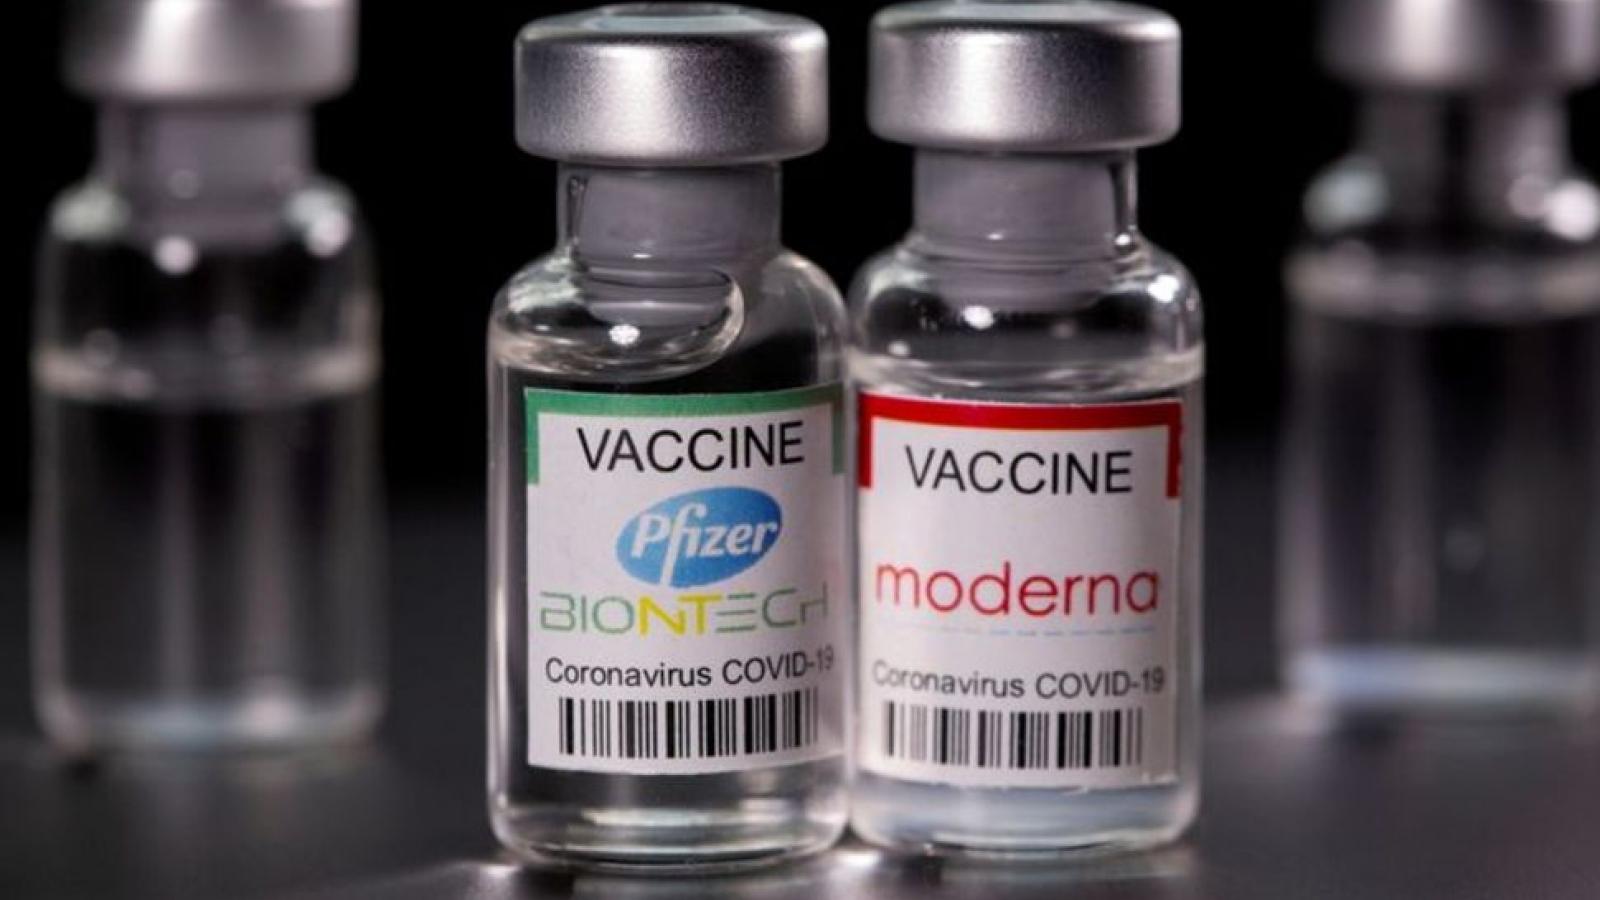 Vietnam considers mixing vaccines with Moderna jab